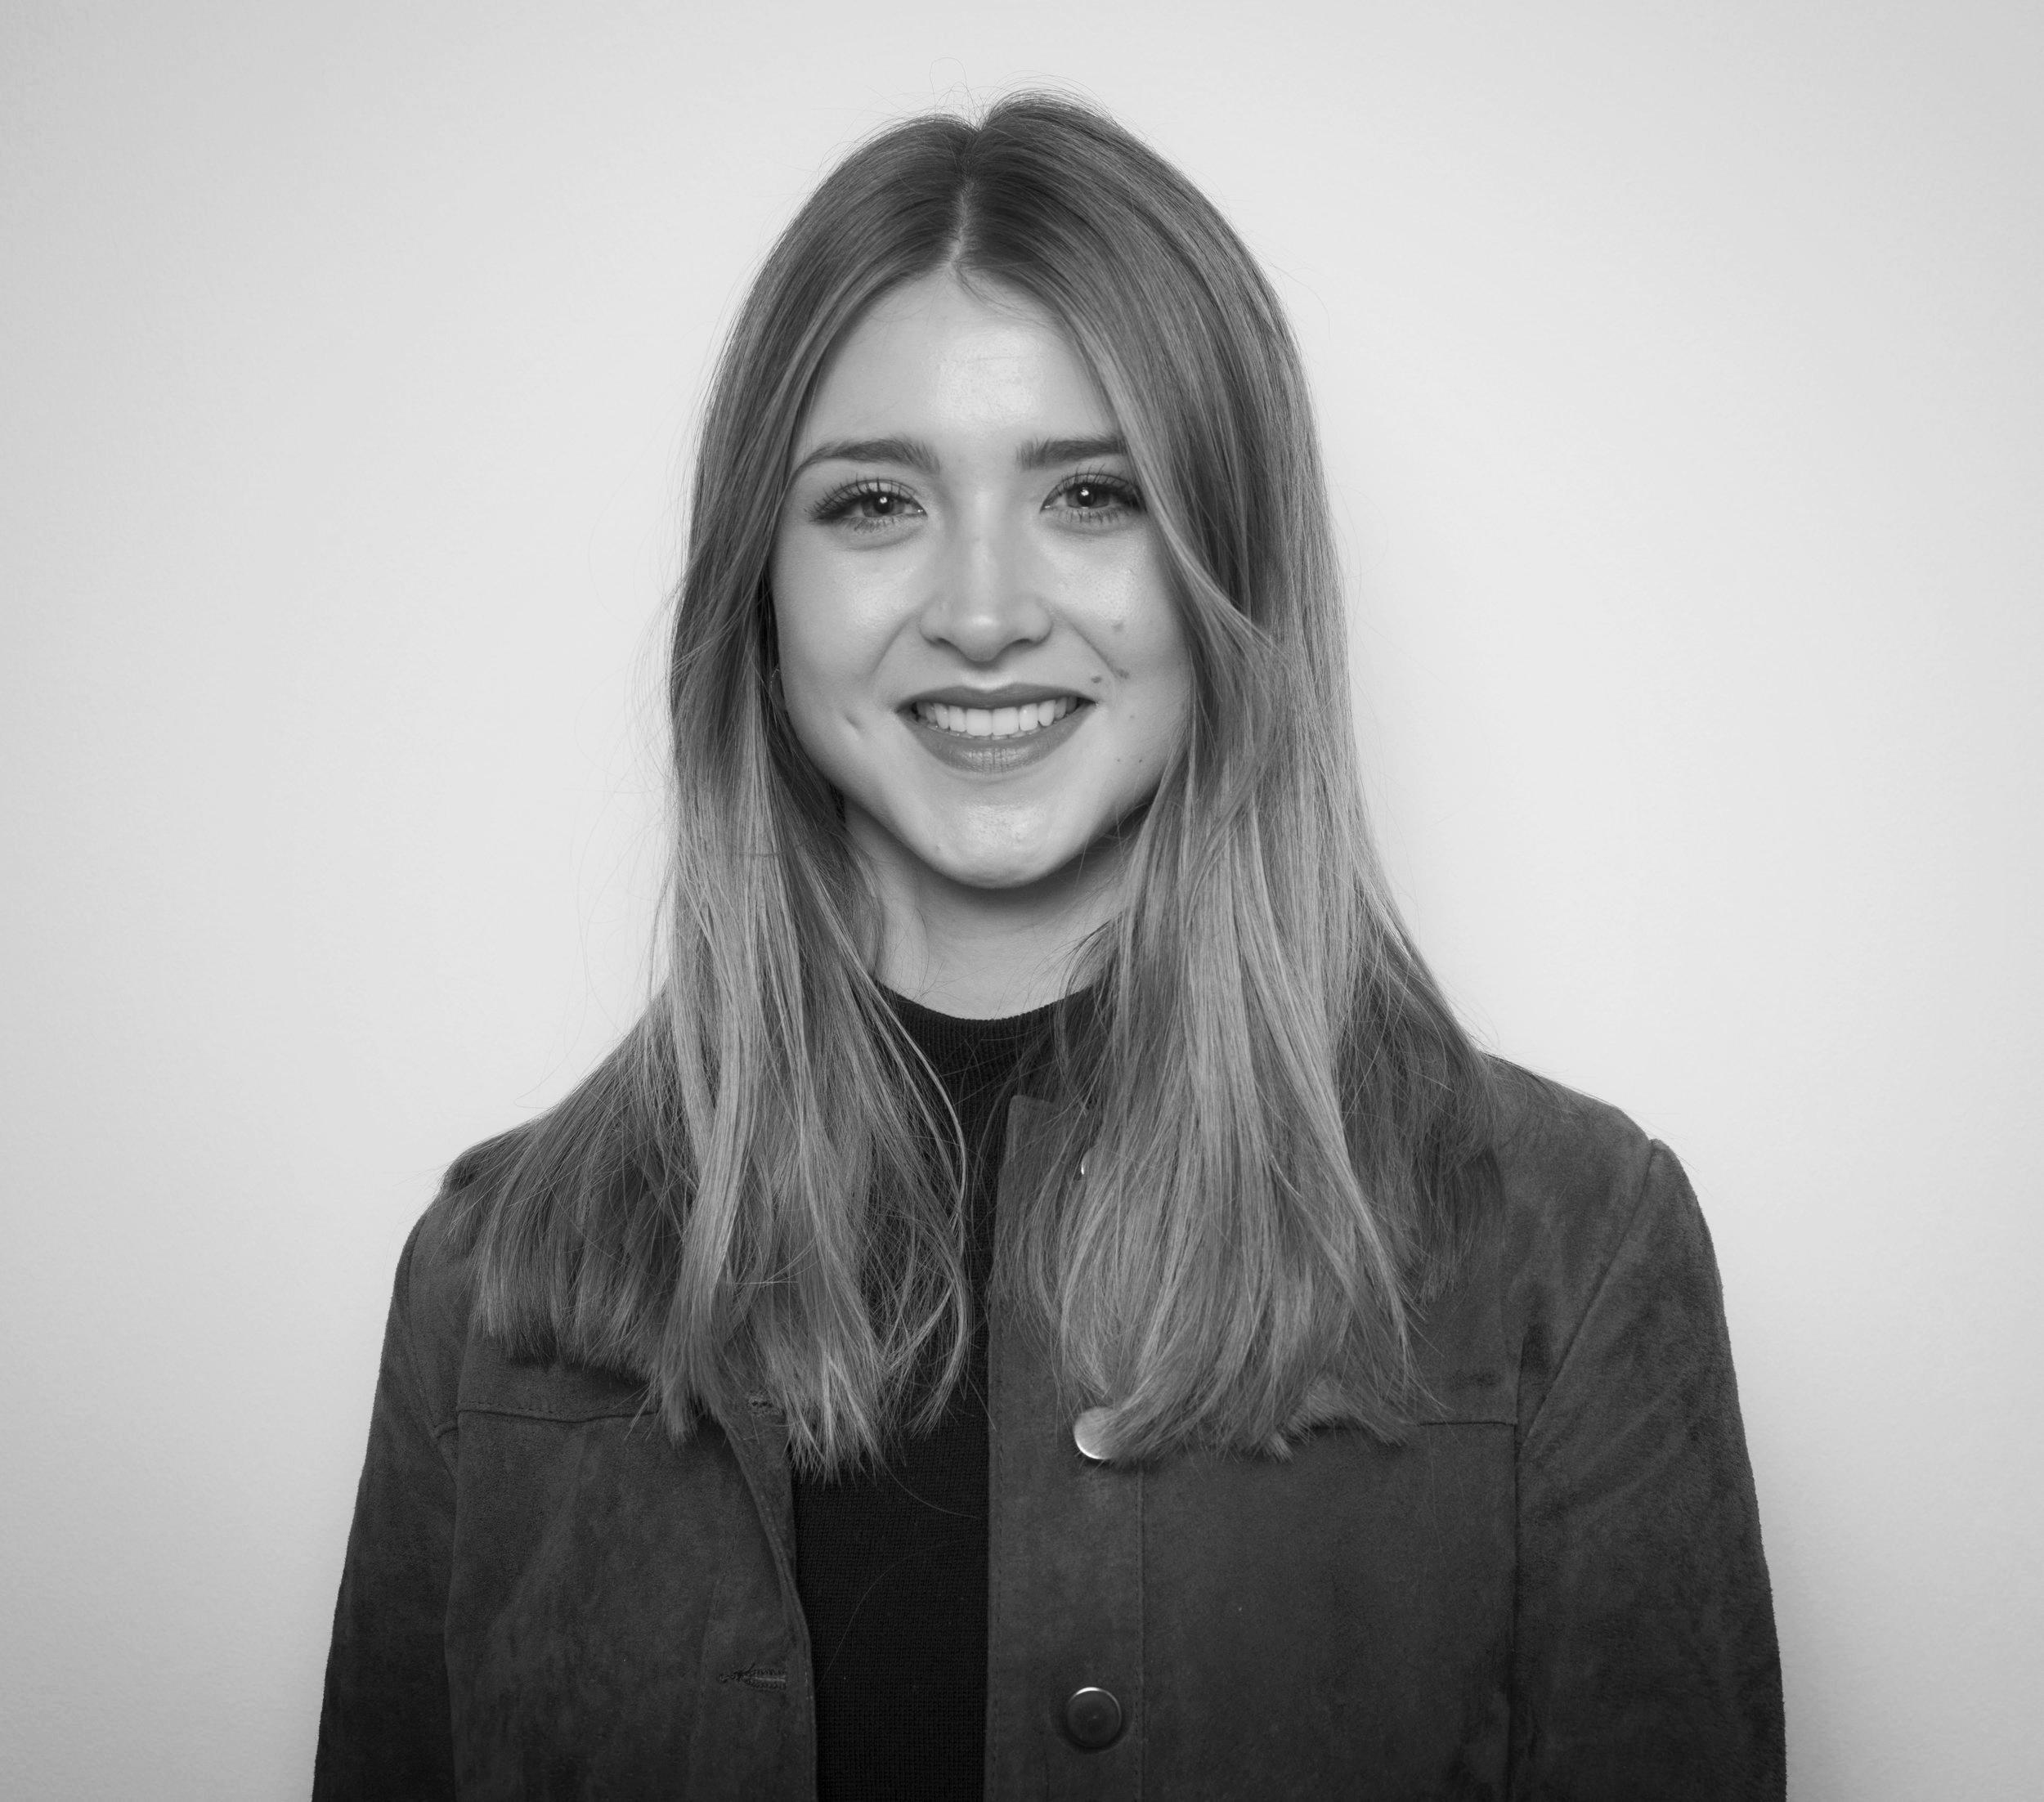 <b>Hannah Clayton</b><br>Junior Account Executive, Lifestyle